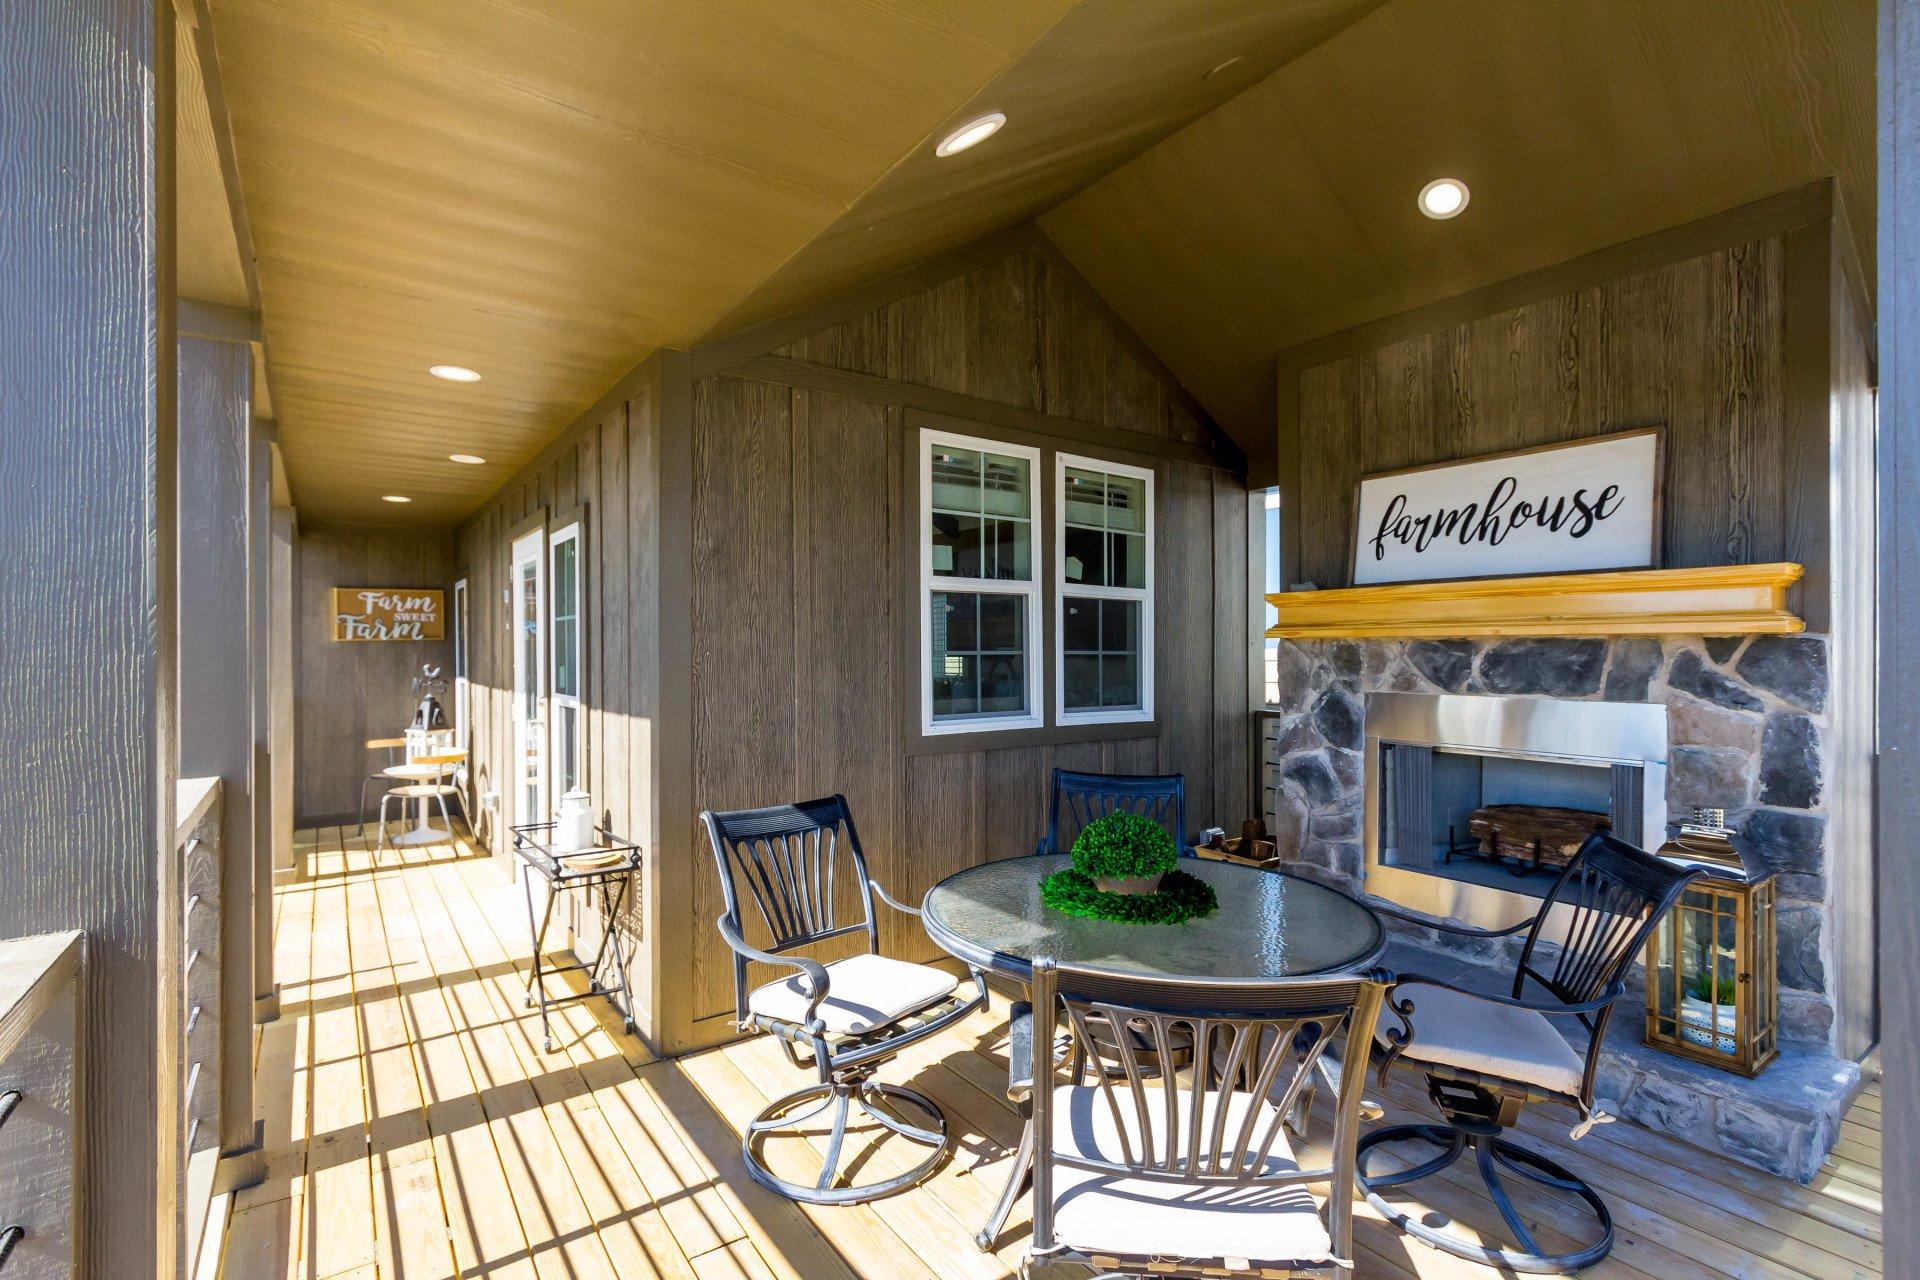 Tiny Homes 523 Porch North Texas Factory Showcase Homes Llc